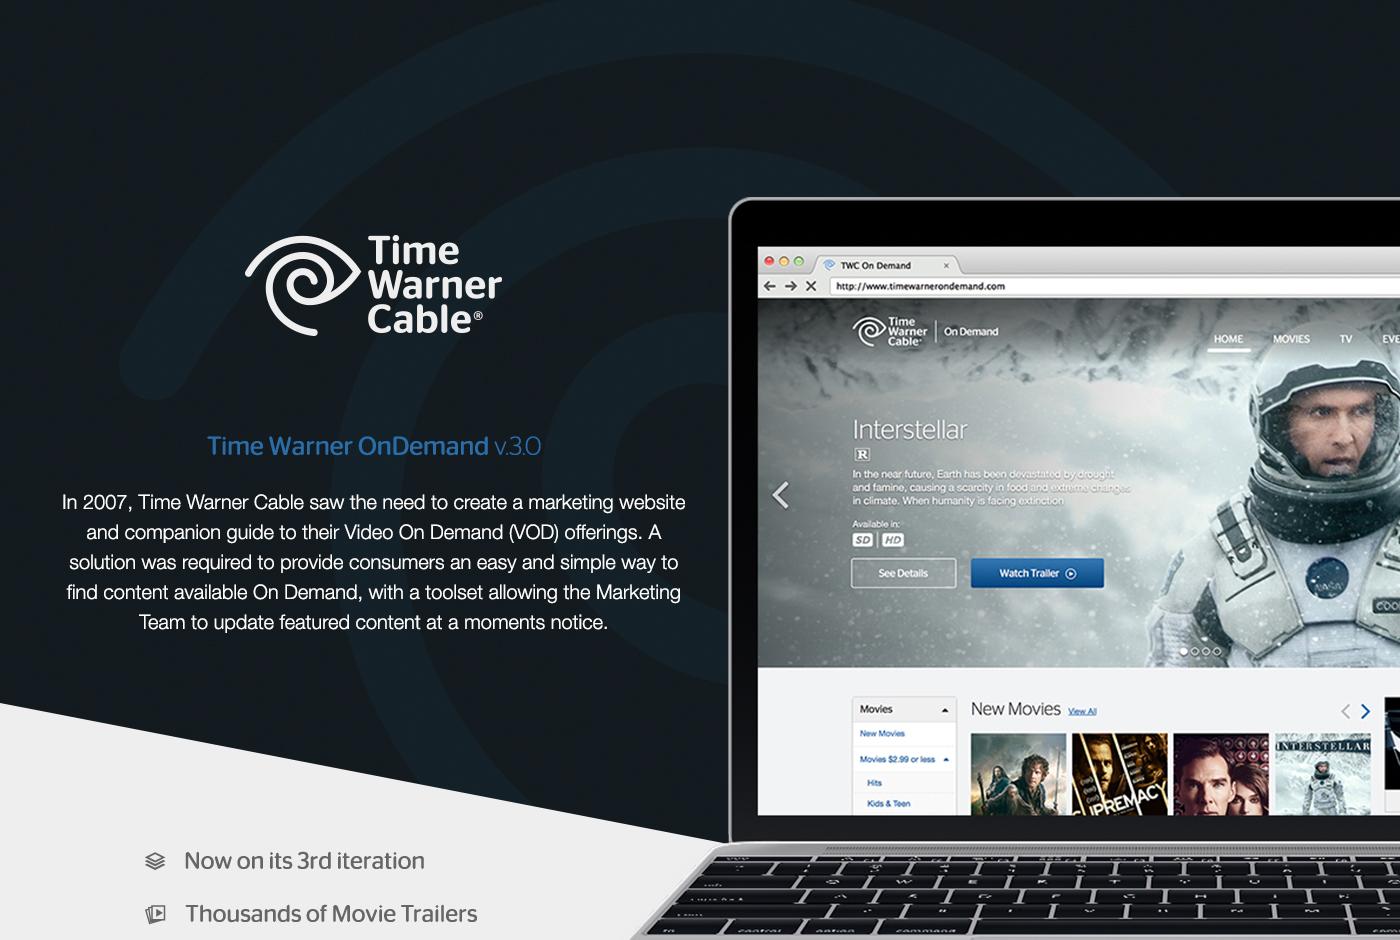 user experience time warner Time Warner Cable TWC On Demand cms video Asset Management Enterprise Platforms